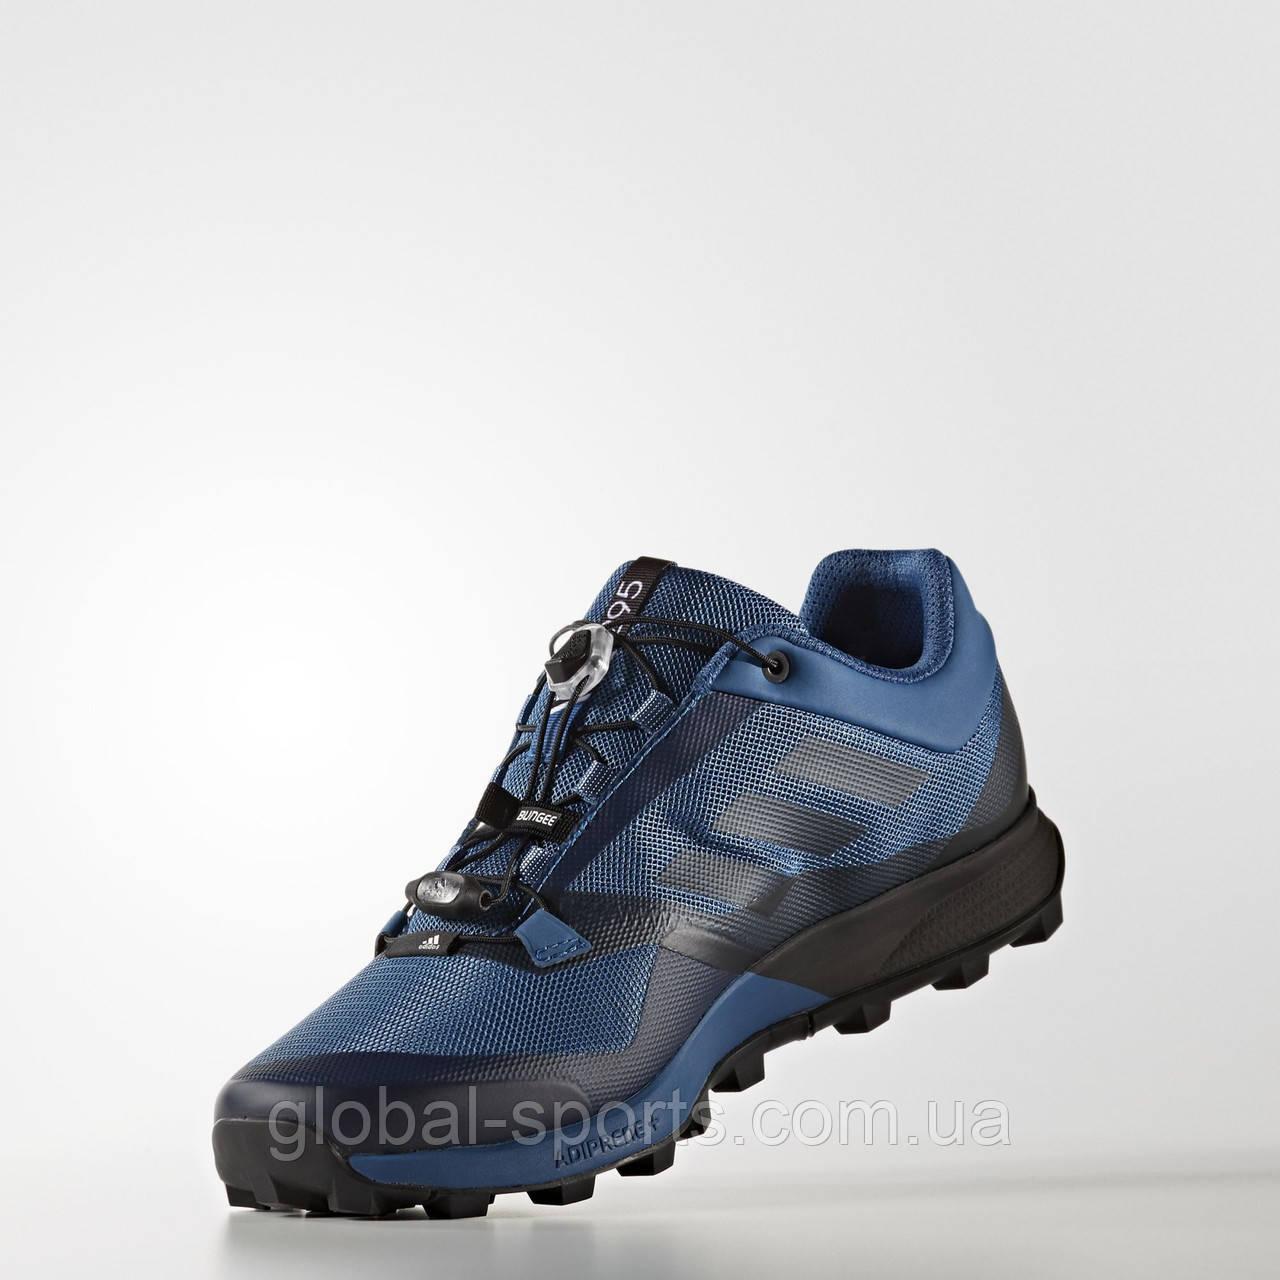 99d9115d7269 Мужские кроссовки Adidas Terrex Trail Maker (Артикул  BB3359) - Global  Sport в Харькове